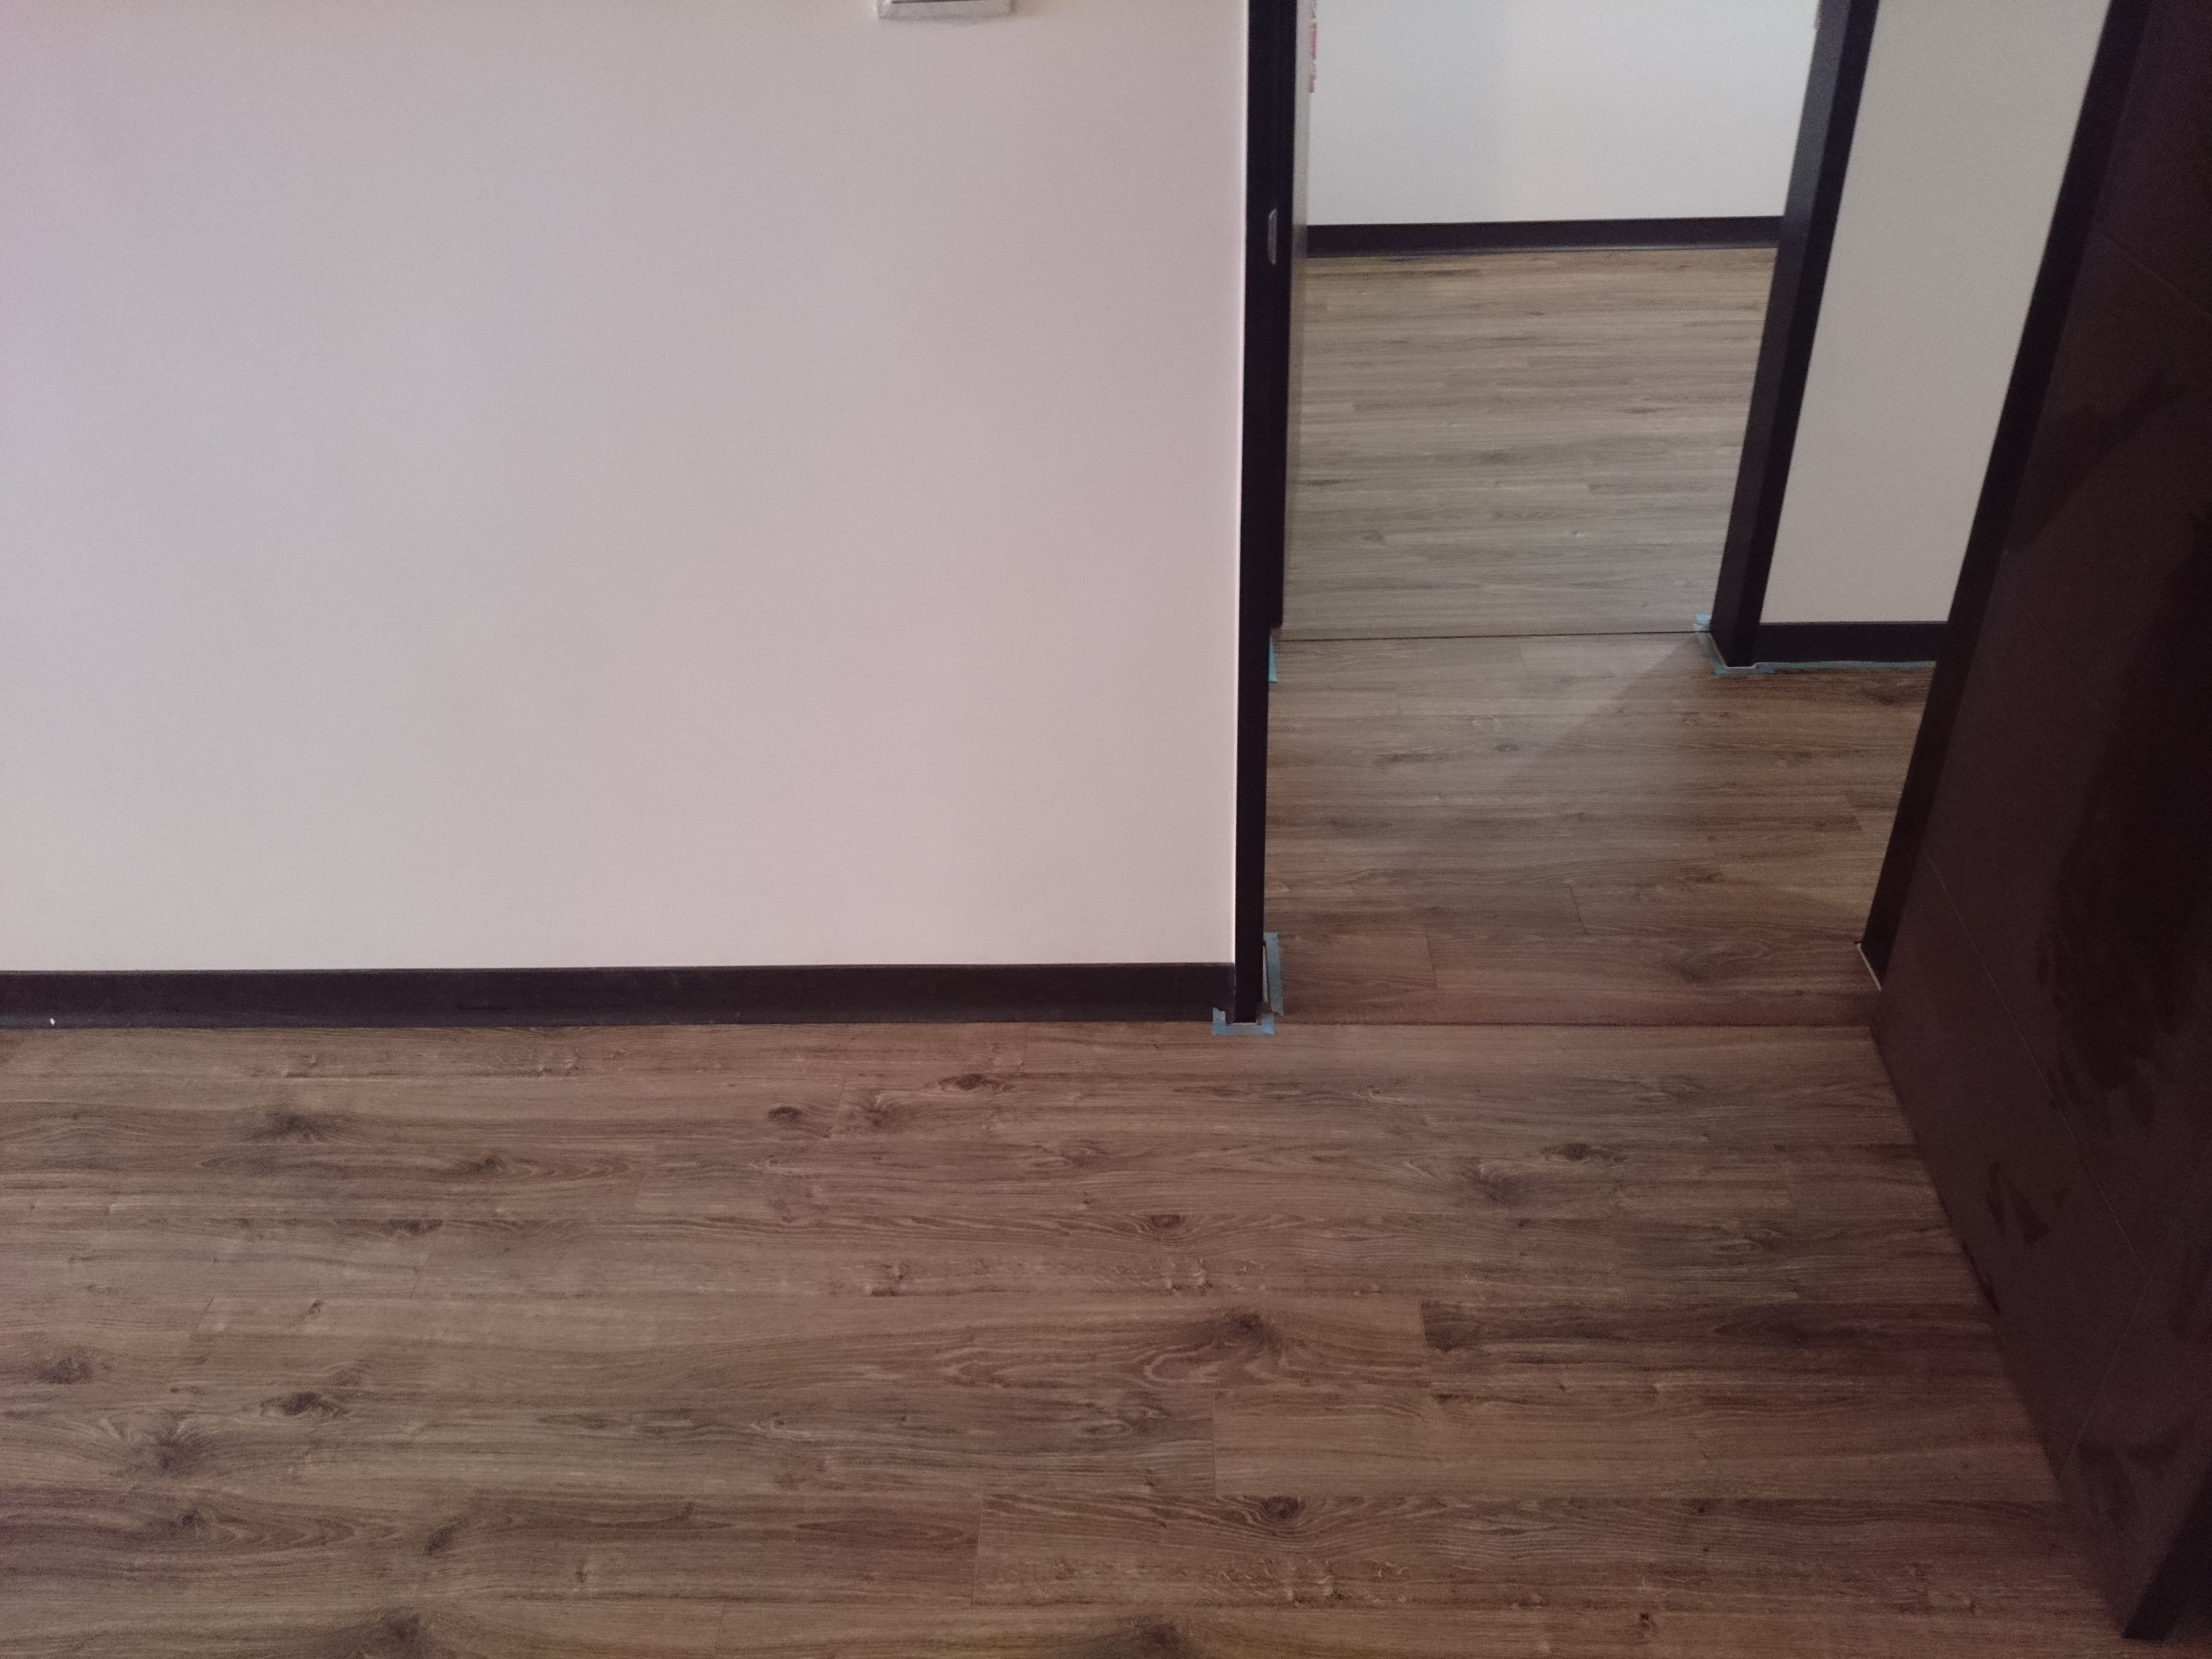 Robina 羅賓超耐磨地板12mm 窄版 蒙大拿州橡木(新北 五股)